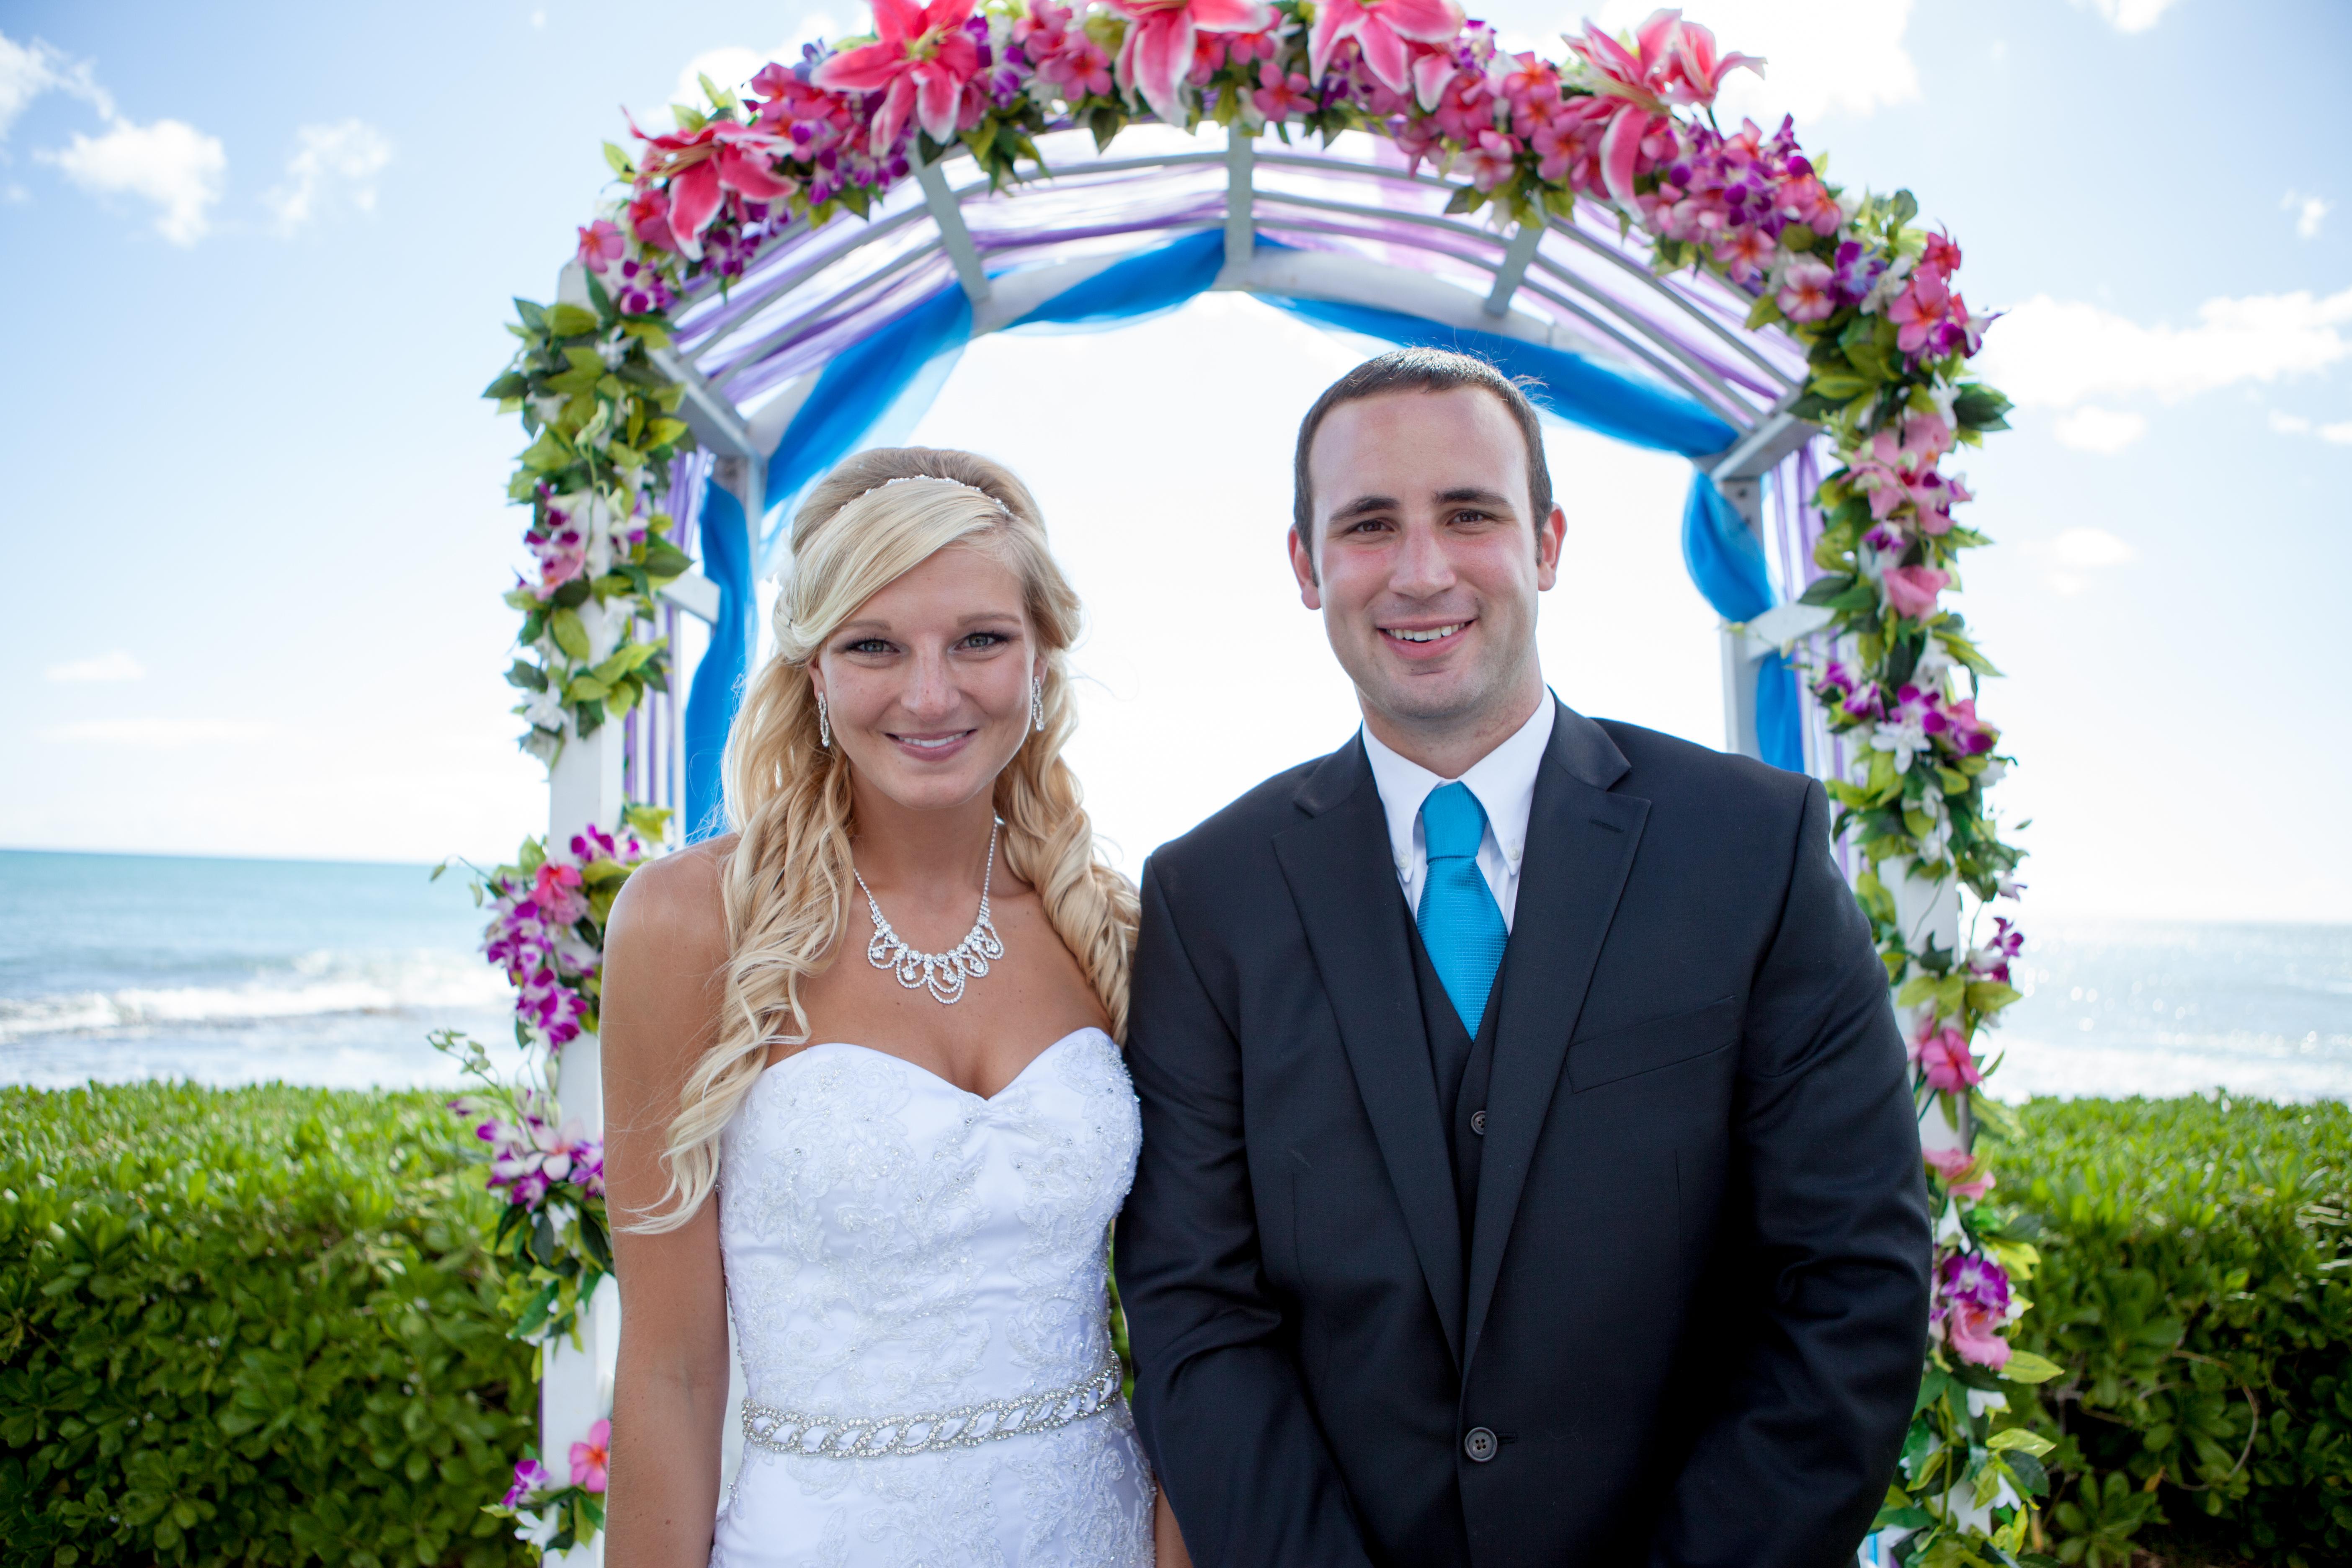 Hawaii wedding paradise cove 18